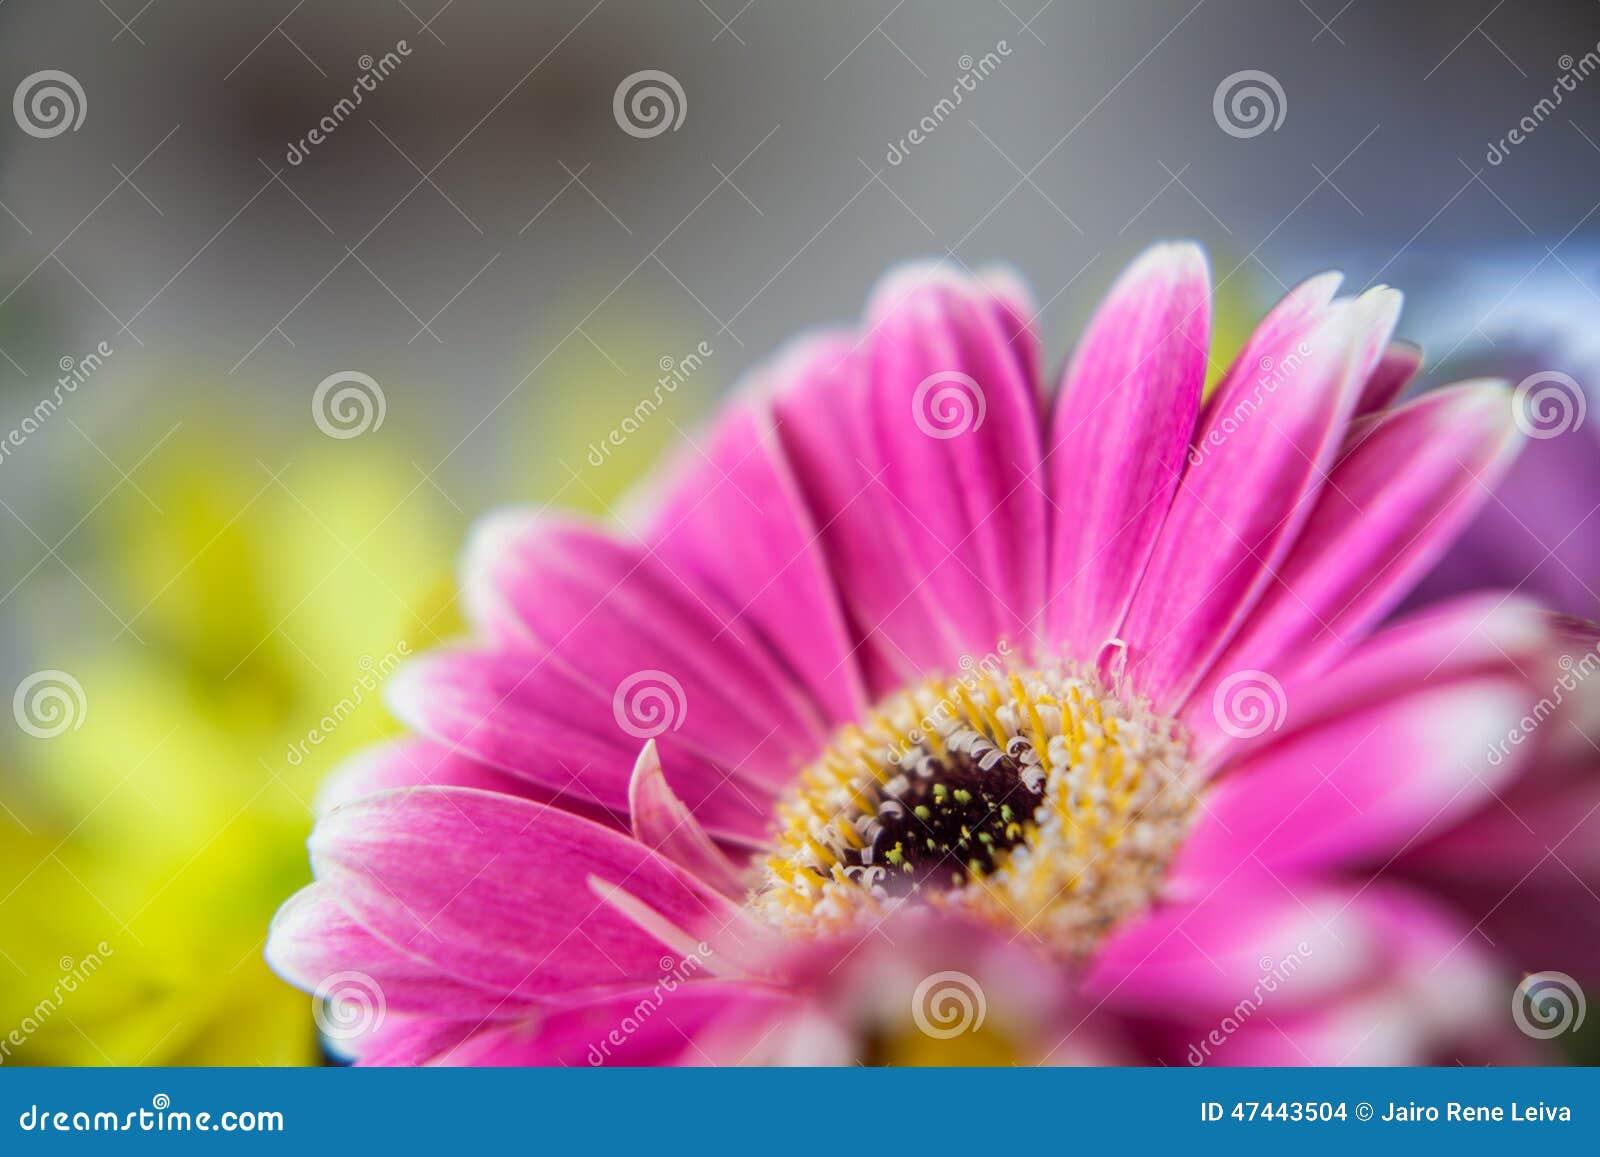 Hot Pink Flower Stock Photo Image Of Closeup Flora 47443504